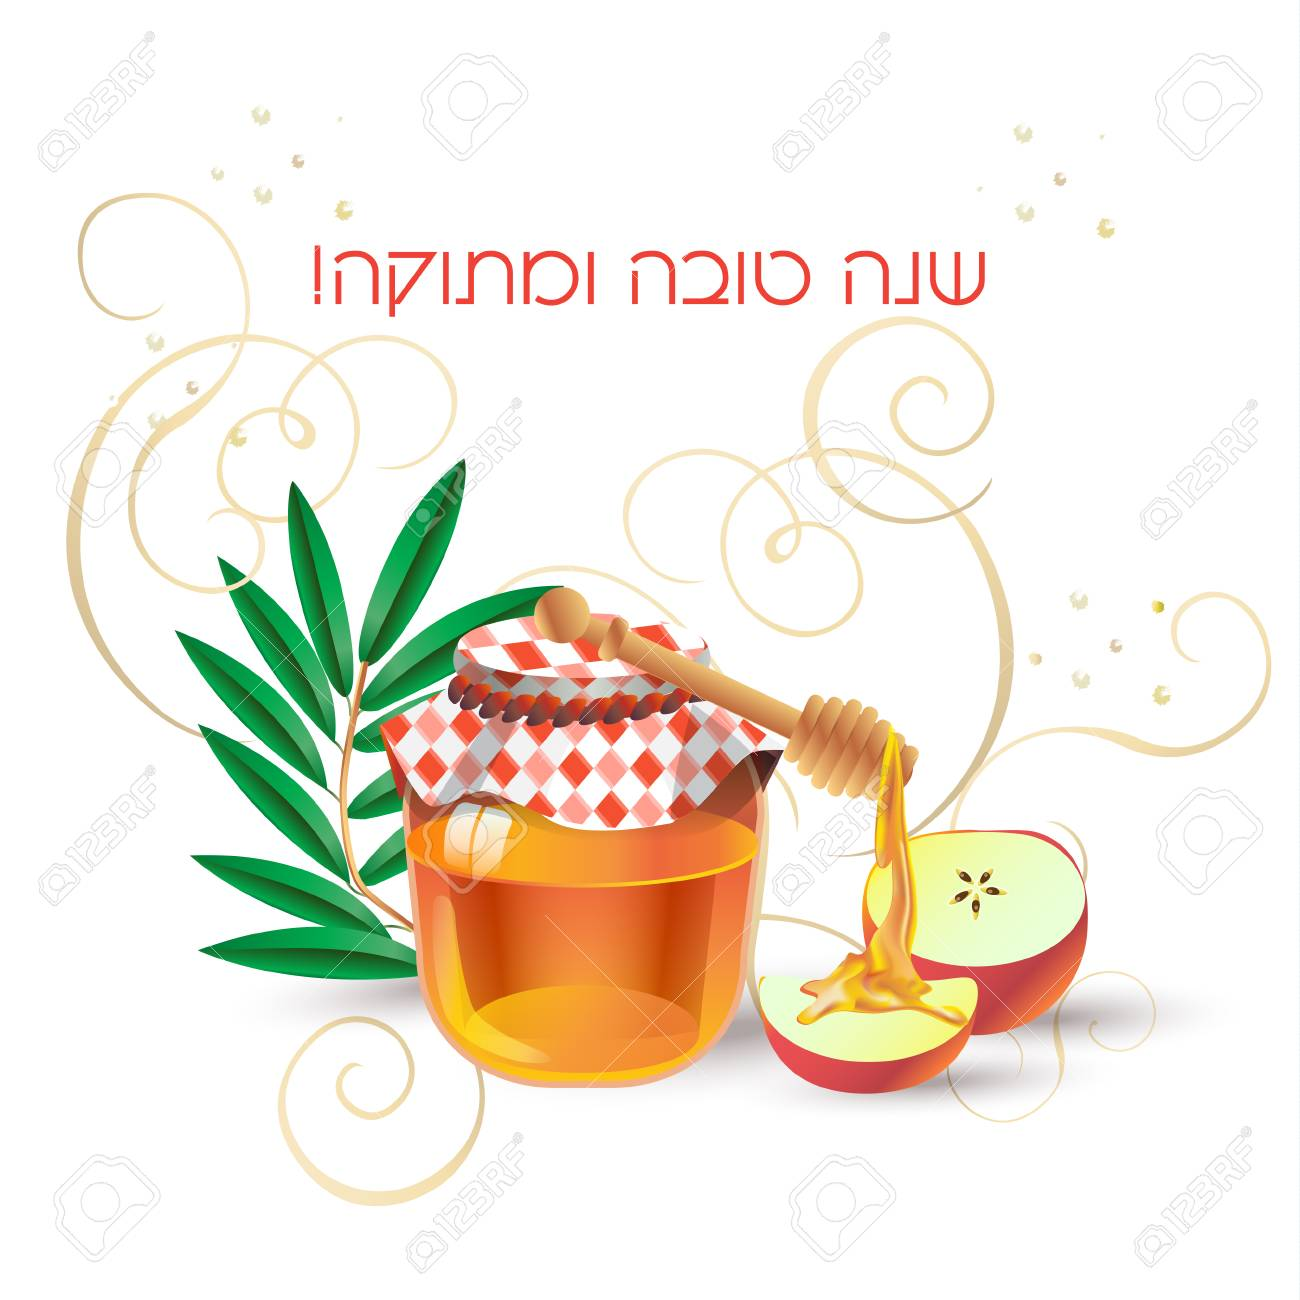 Rosh Hashanah Greeting Card Jewish New Year Text Shana Tova On